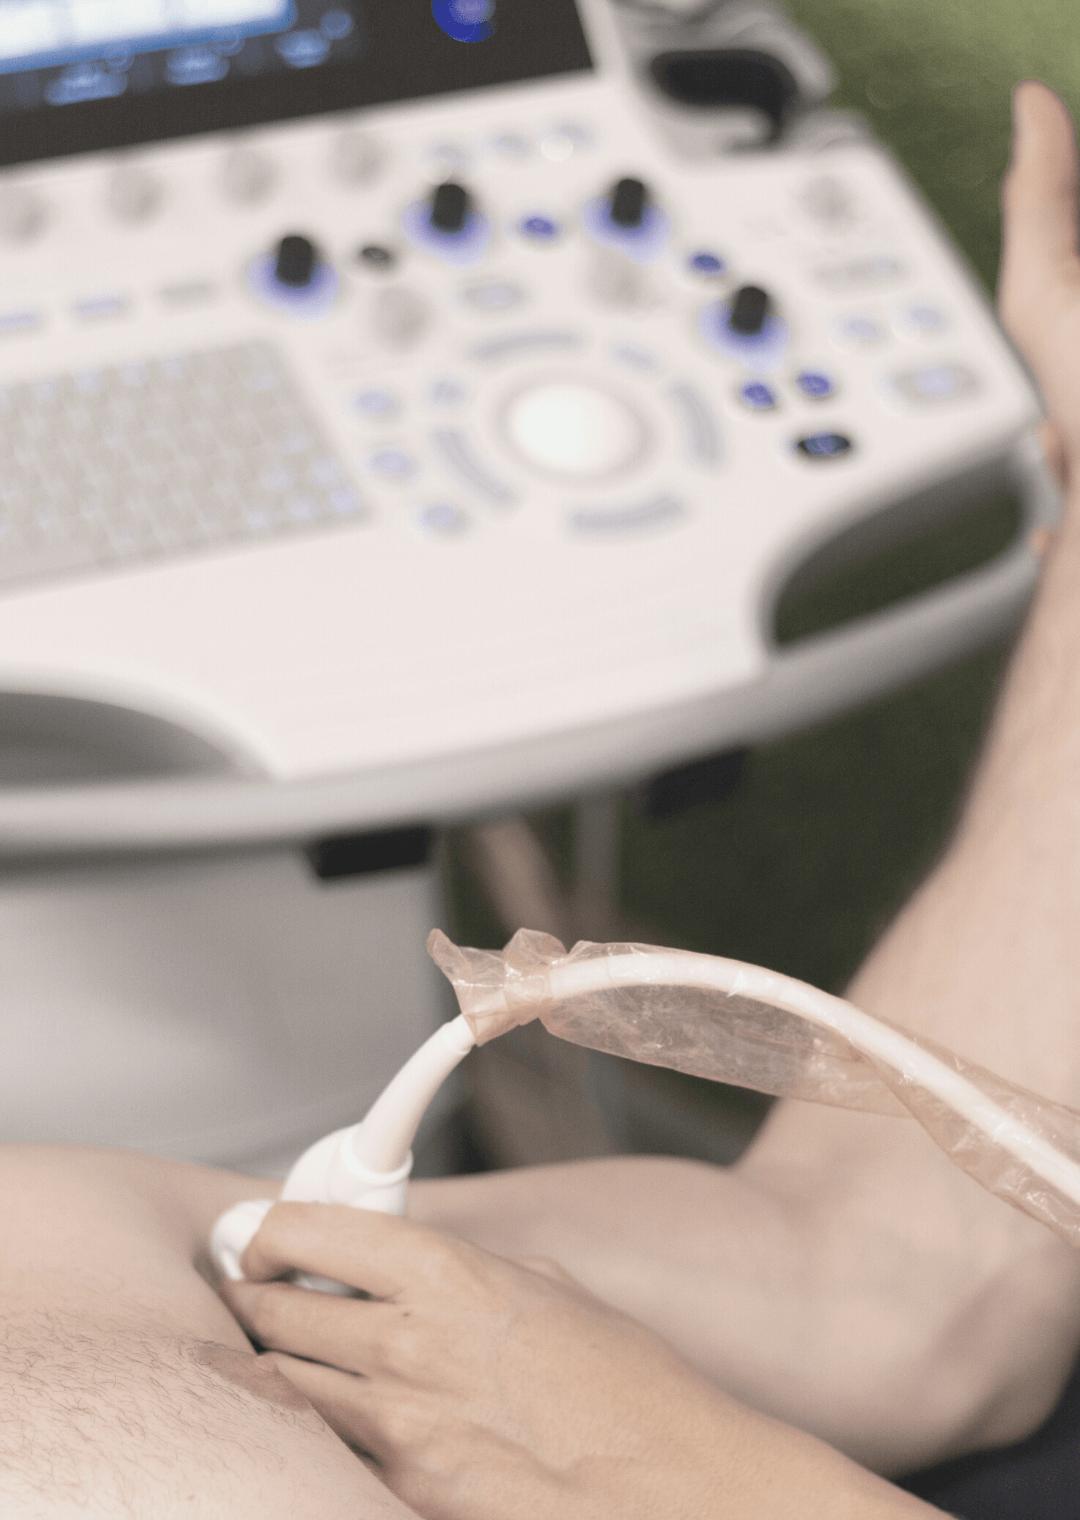 completo-v-curso-avanzado-de-ecografia-musculoesqueletica-cuello-tronco-y-sistema-nervioso-periferico